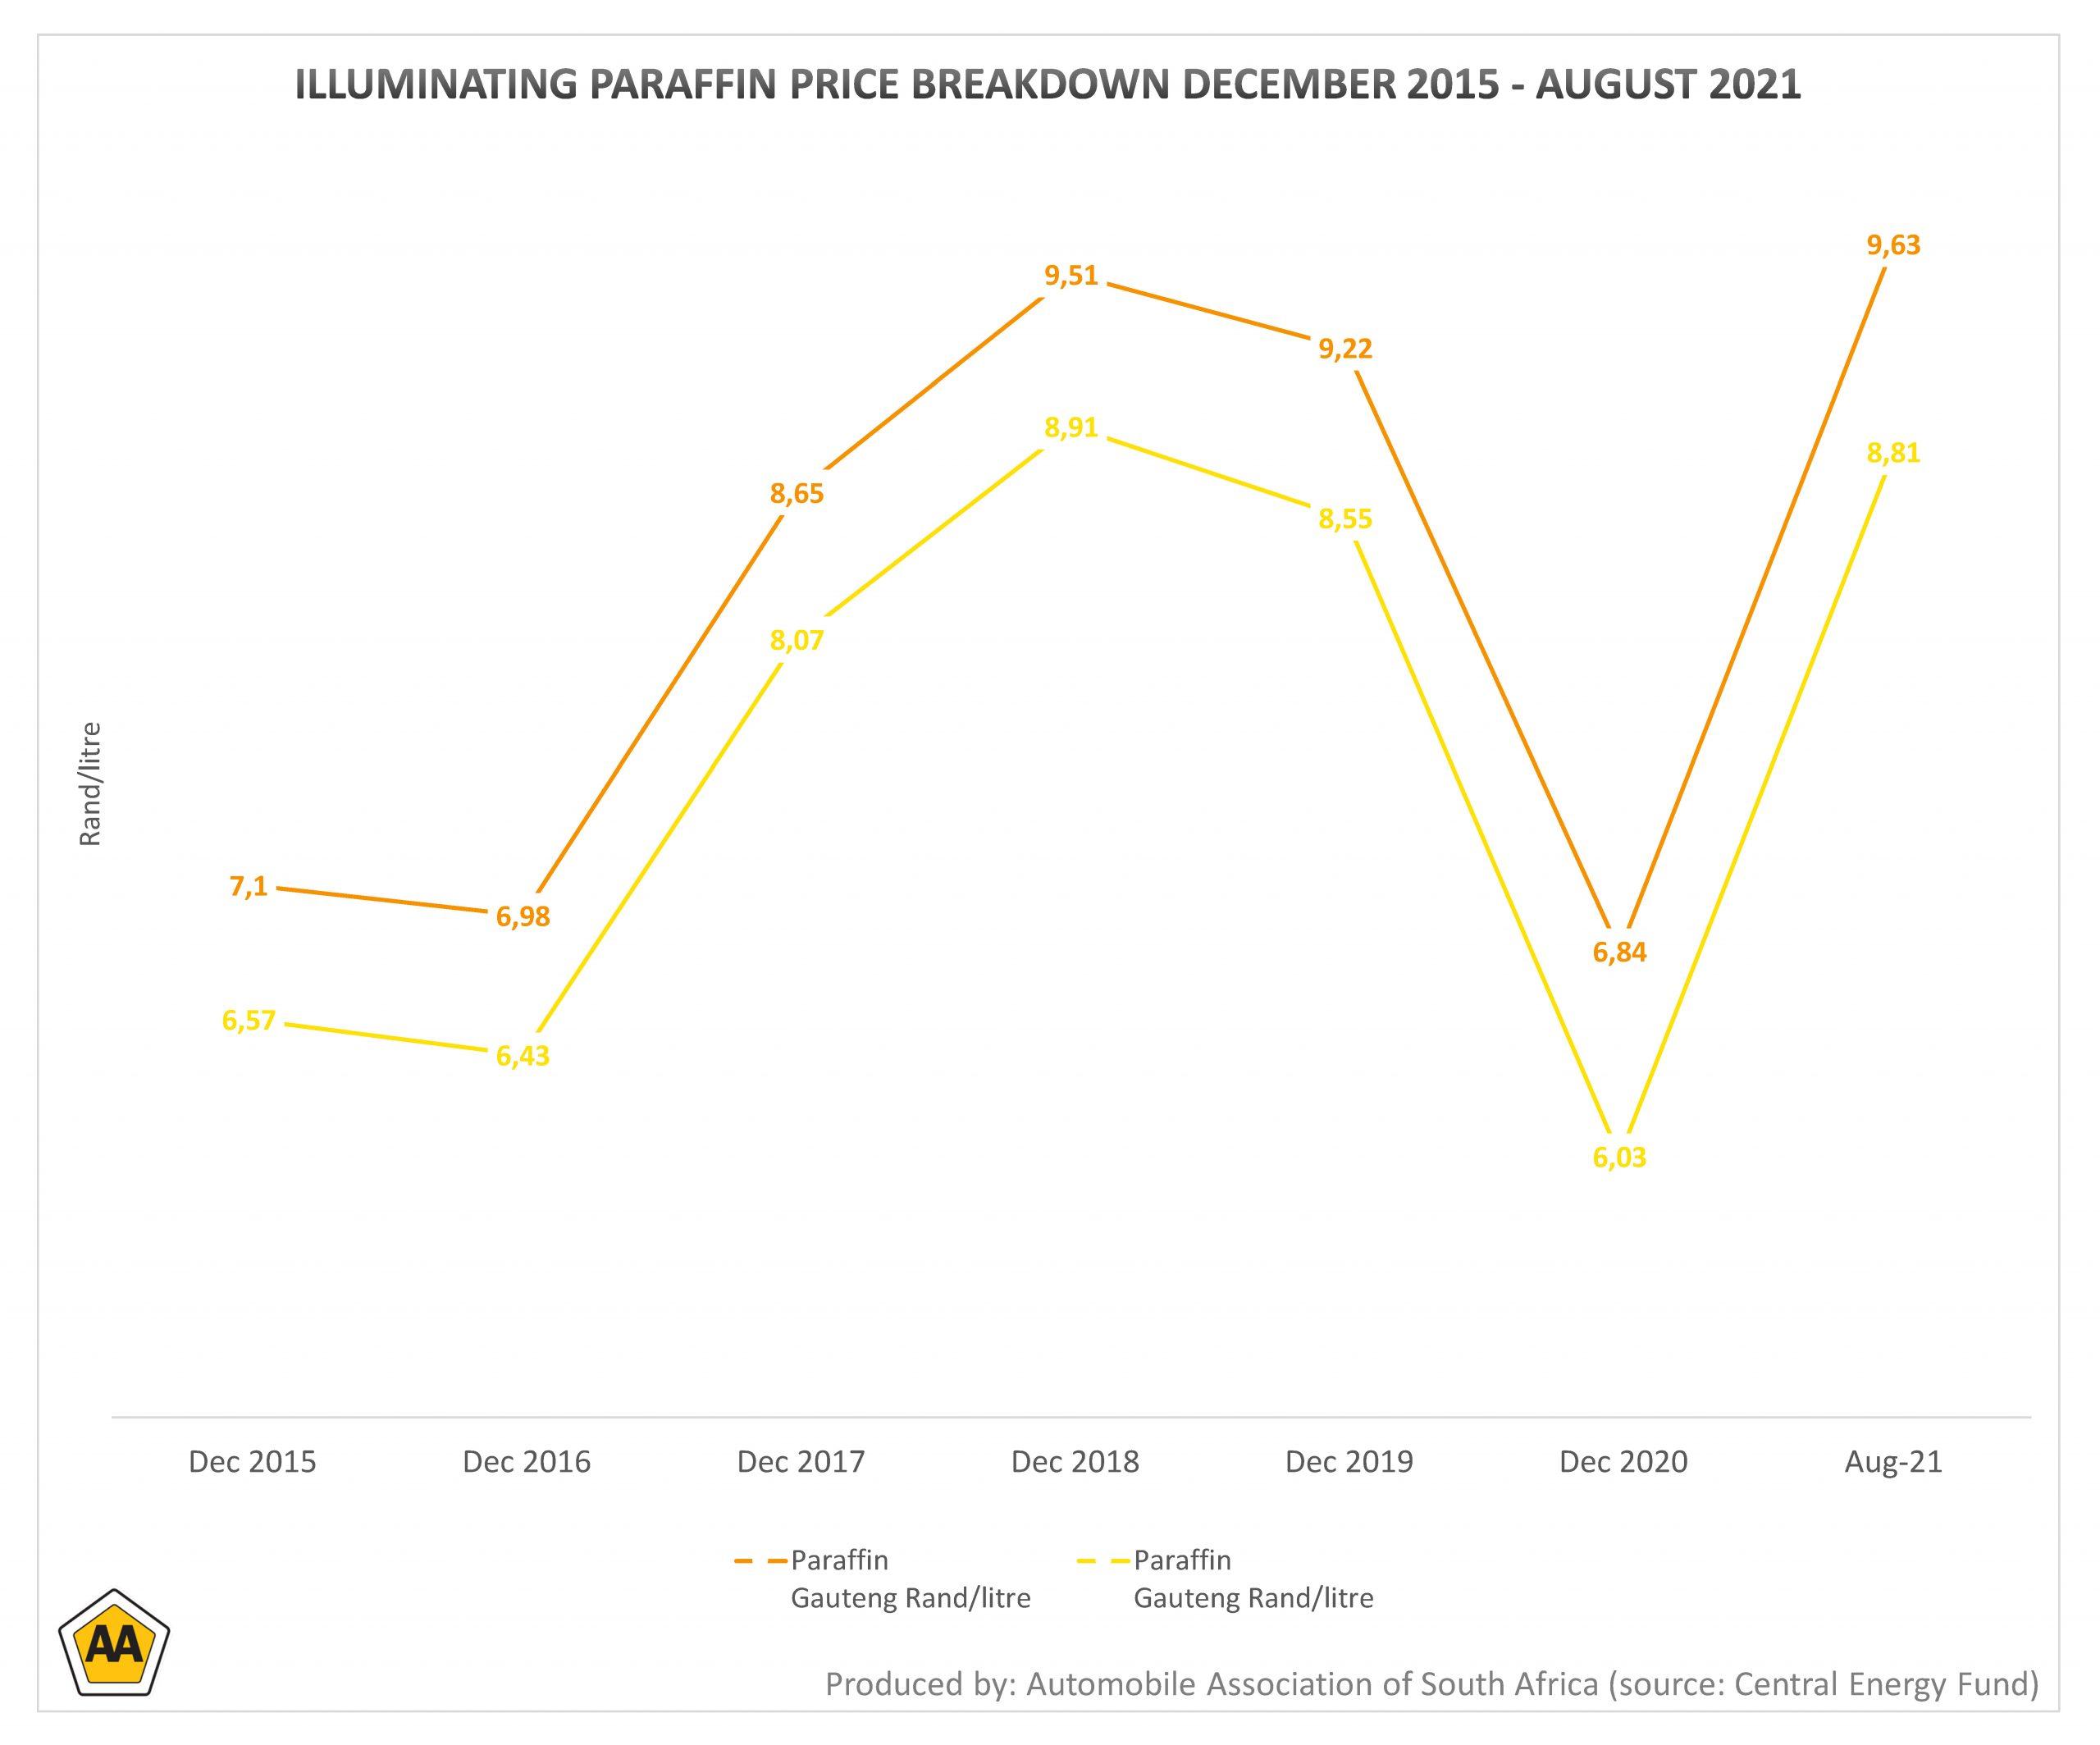 paraffin price breakdown